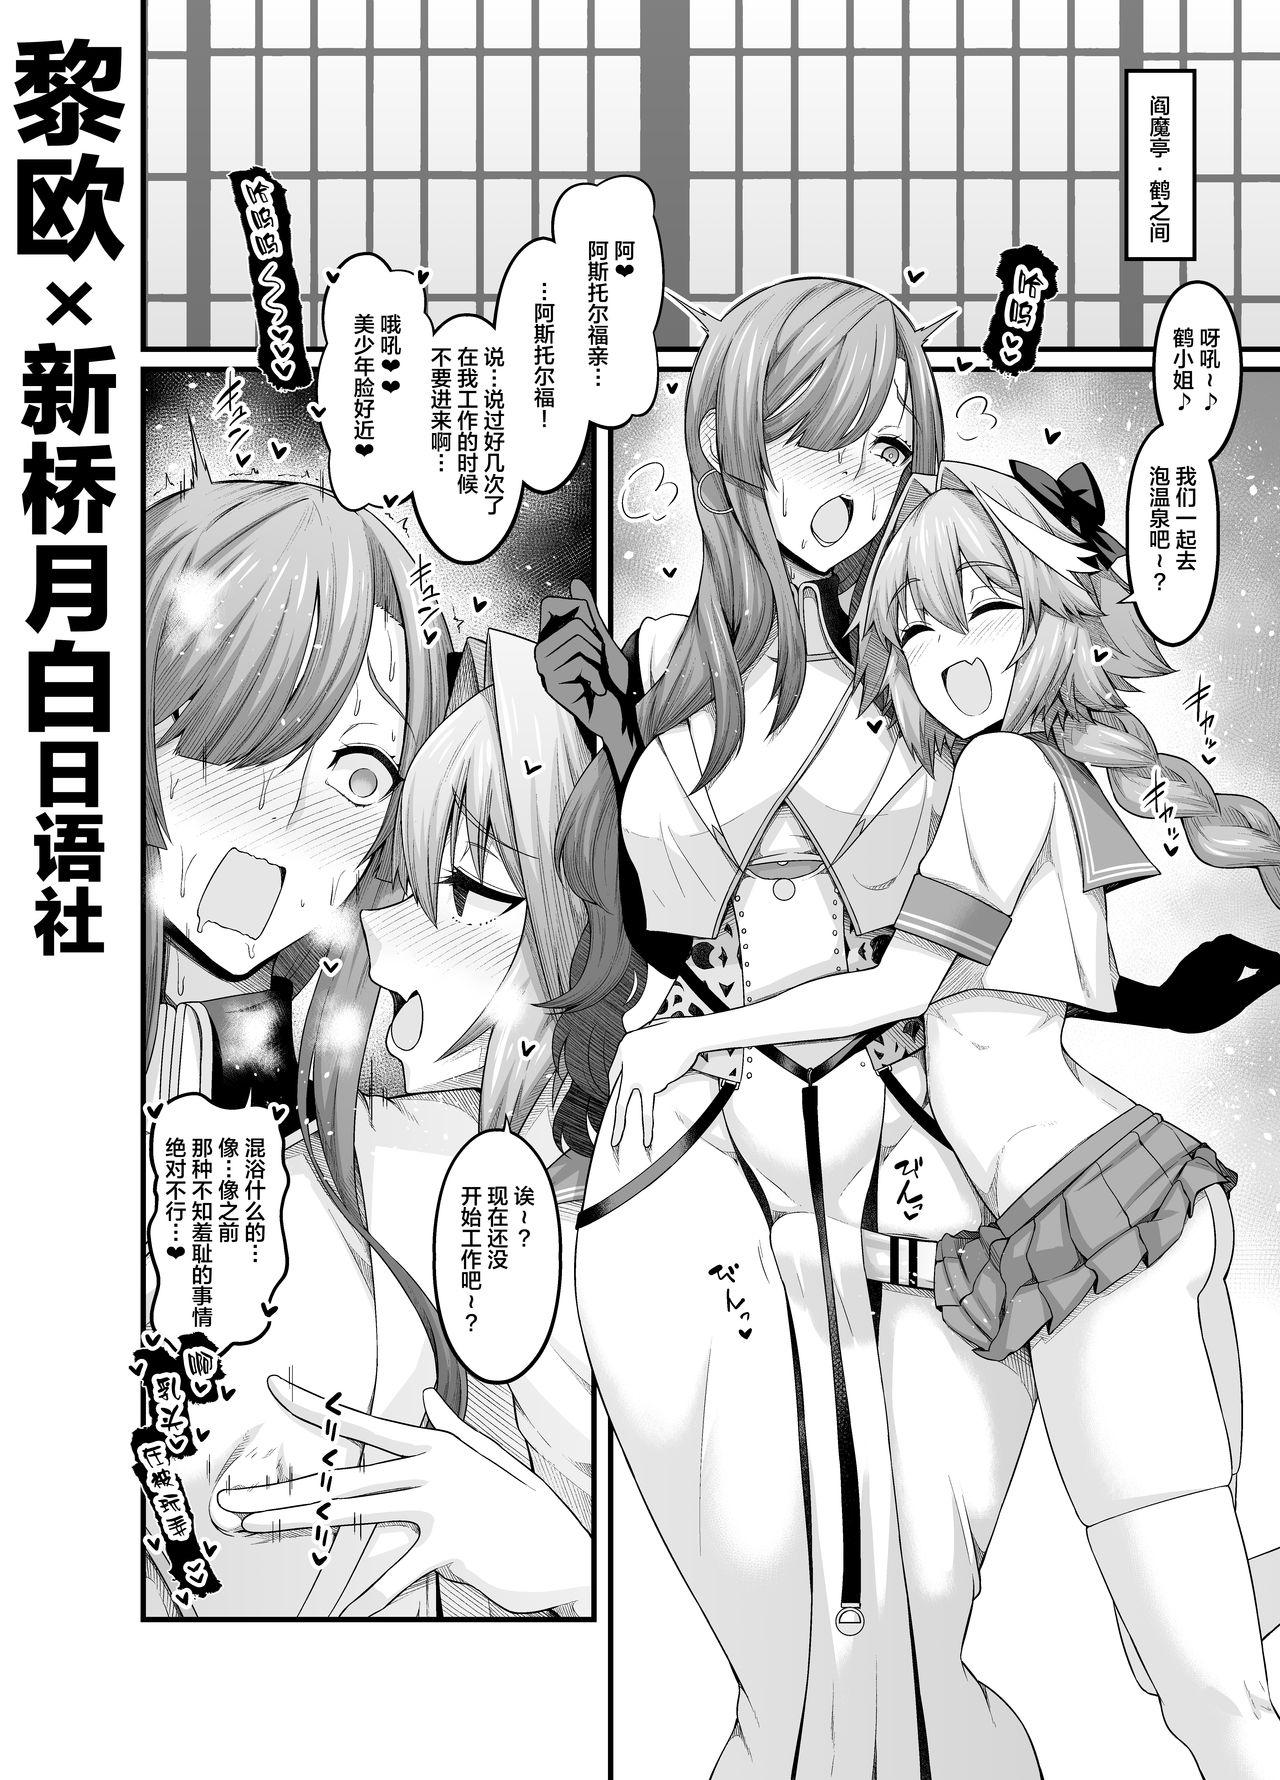 Miss Crane, Astolfo to Nakayoku Naru 0